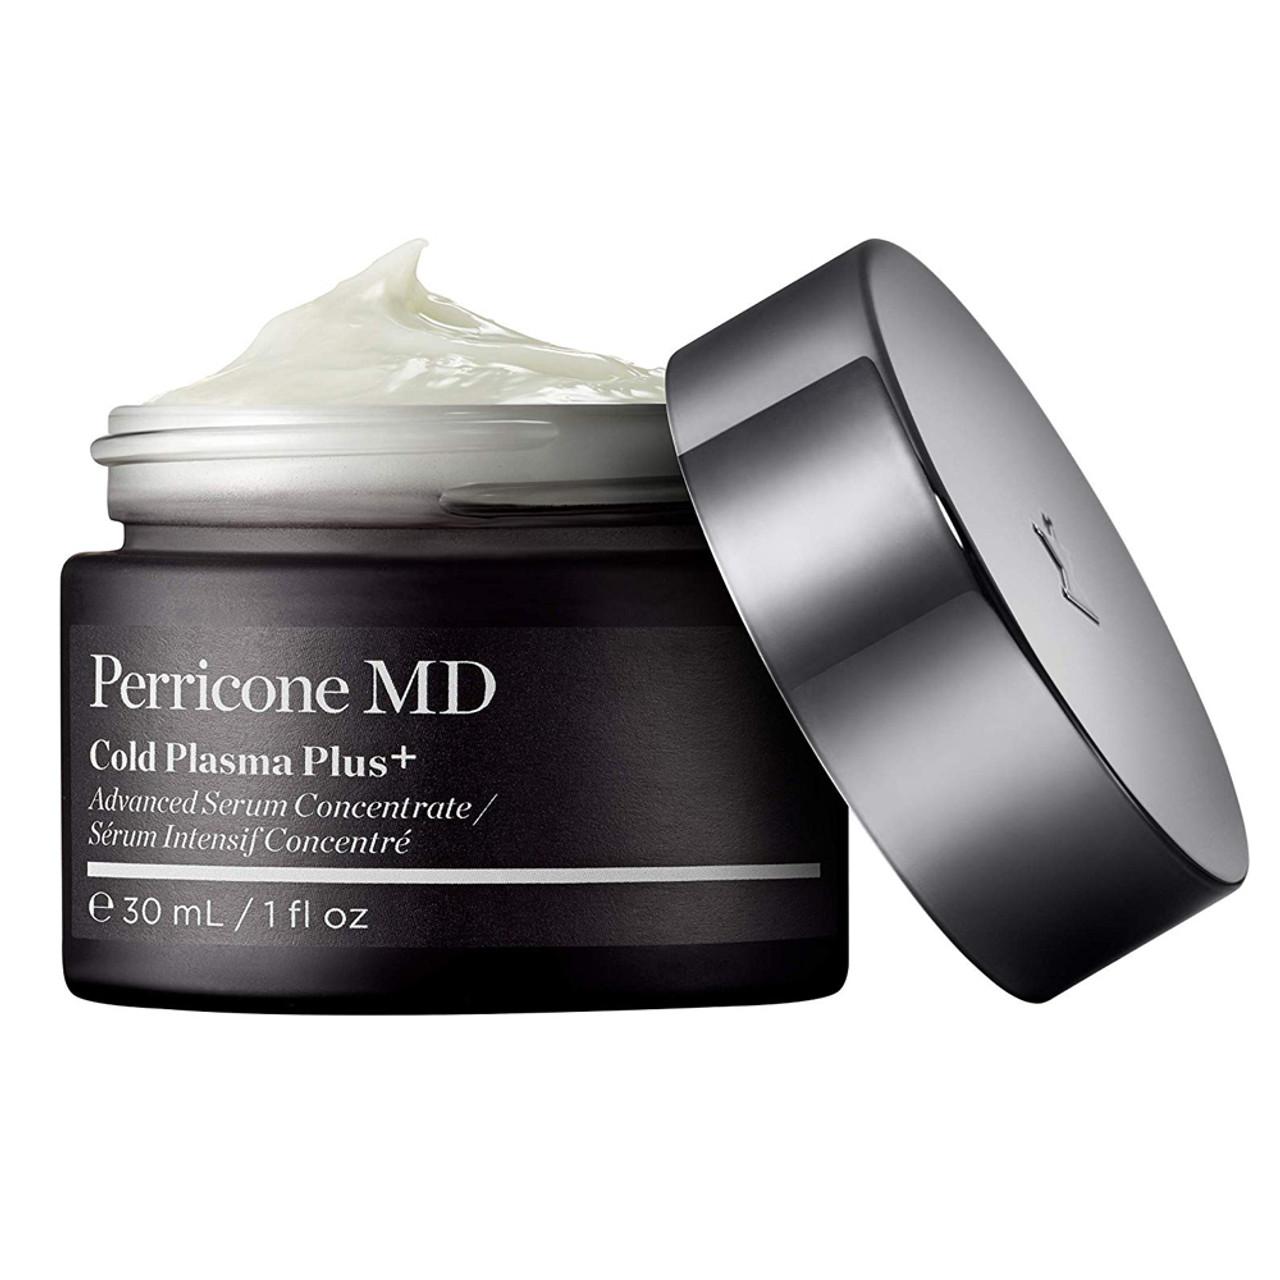 Perricone MD Cold Plasma+Advanced Serum Concentrate